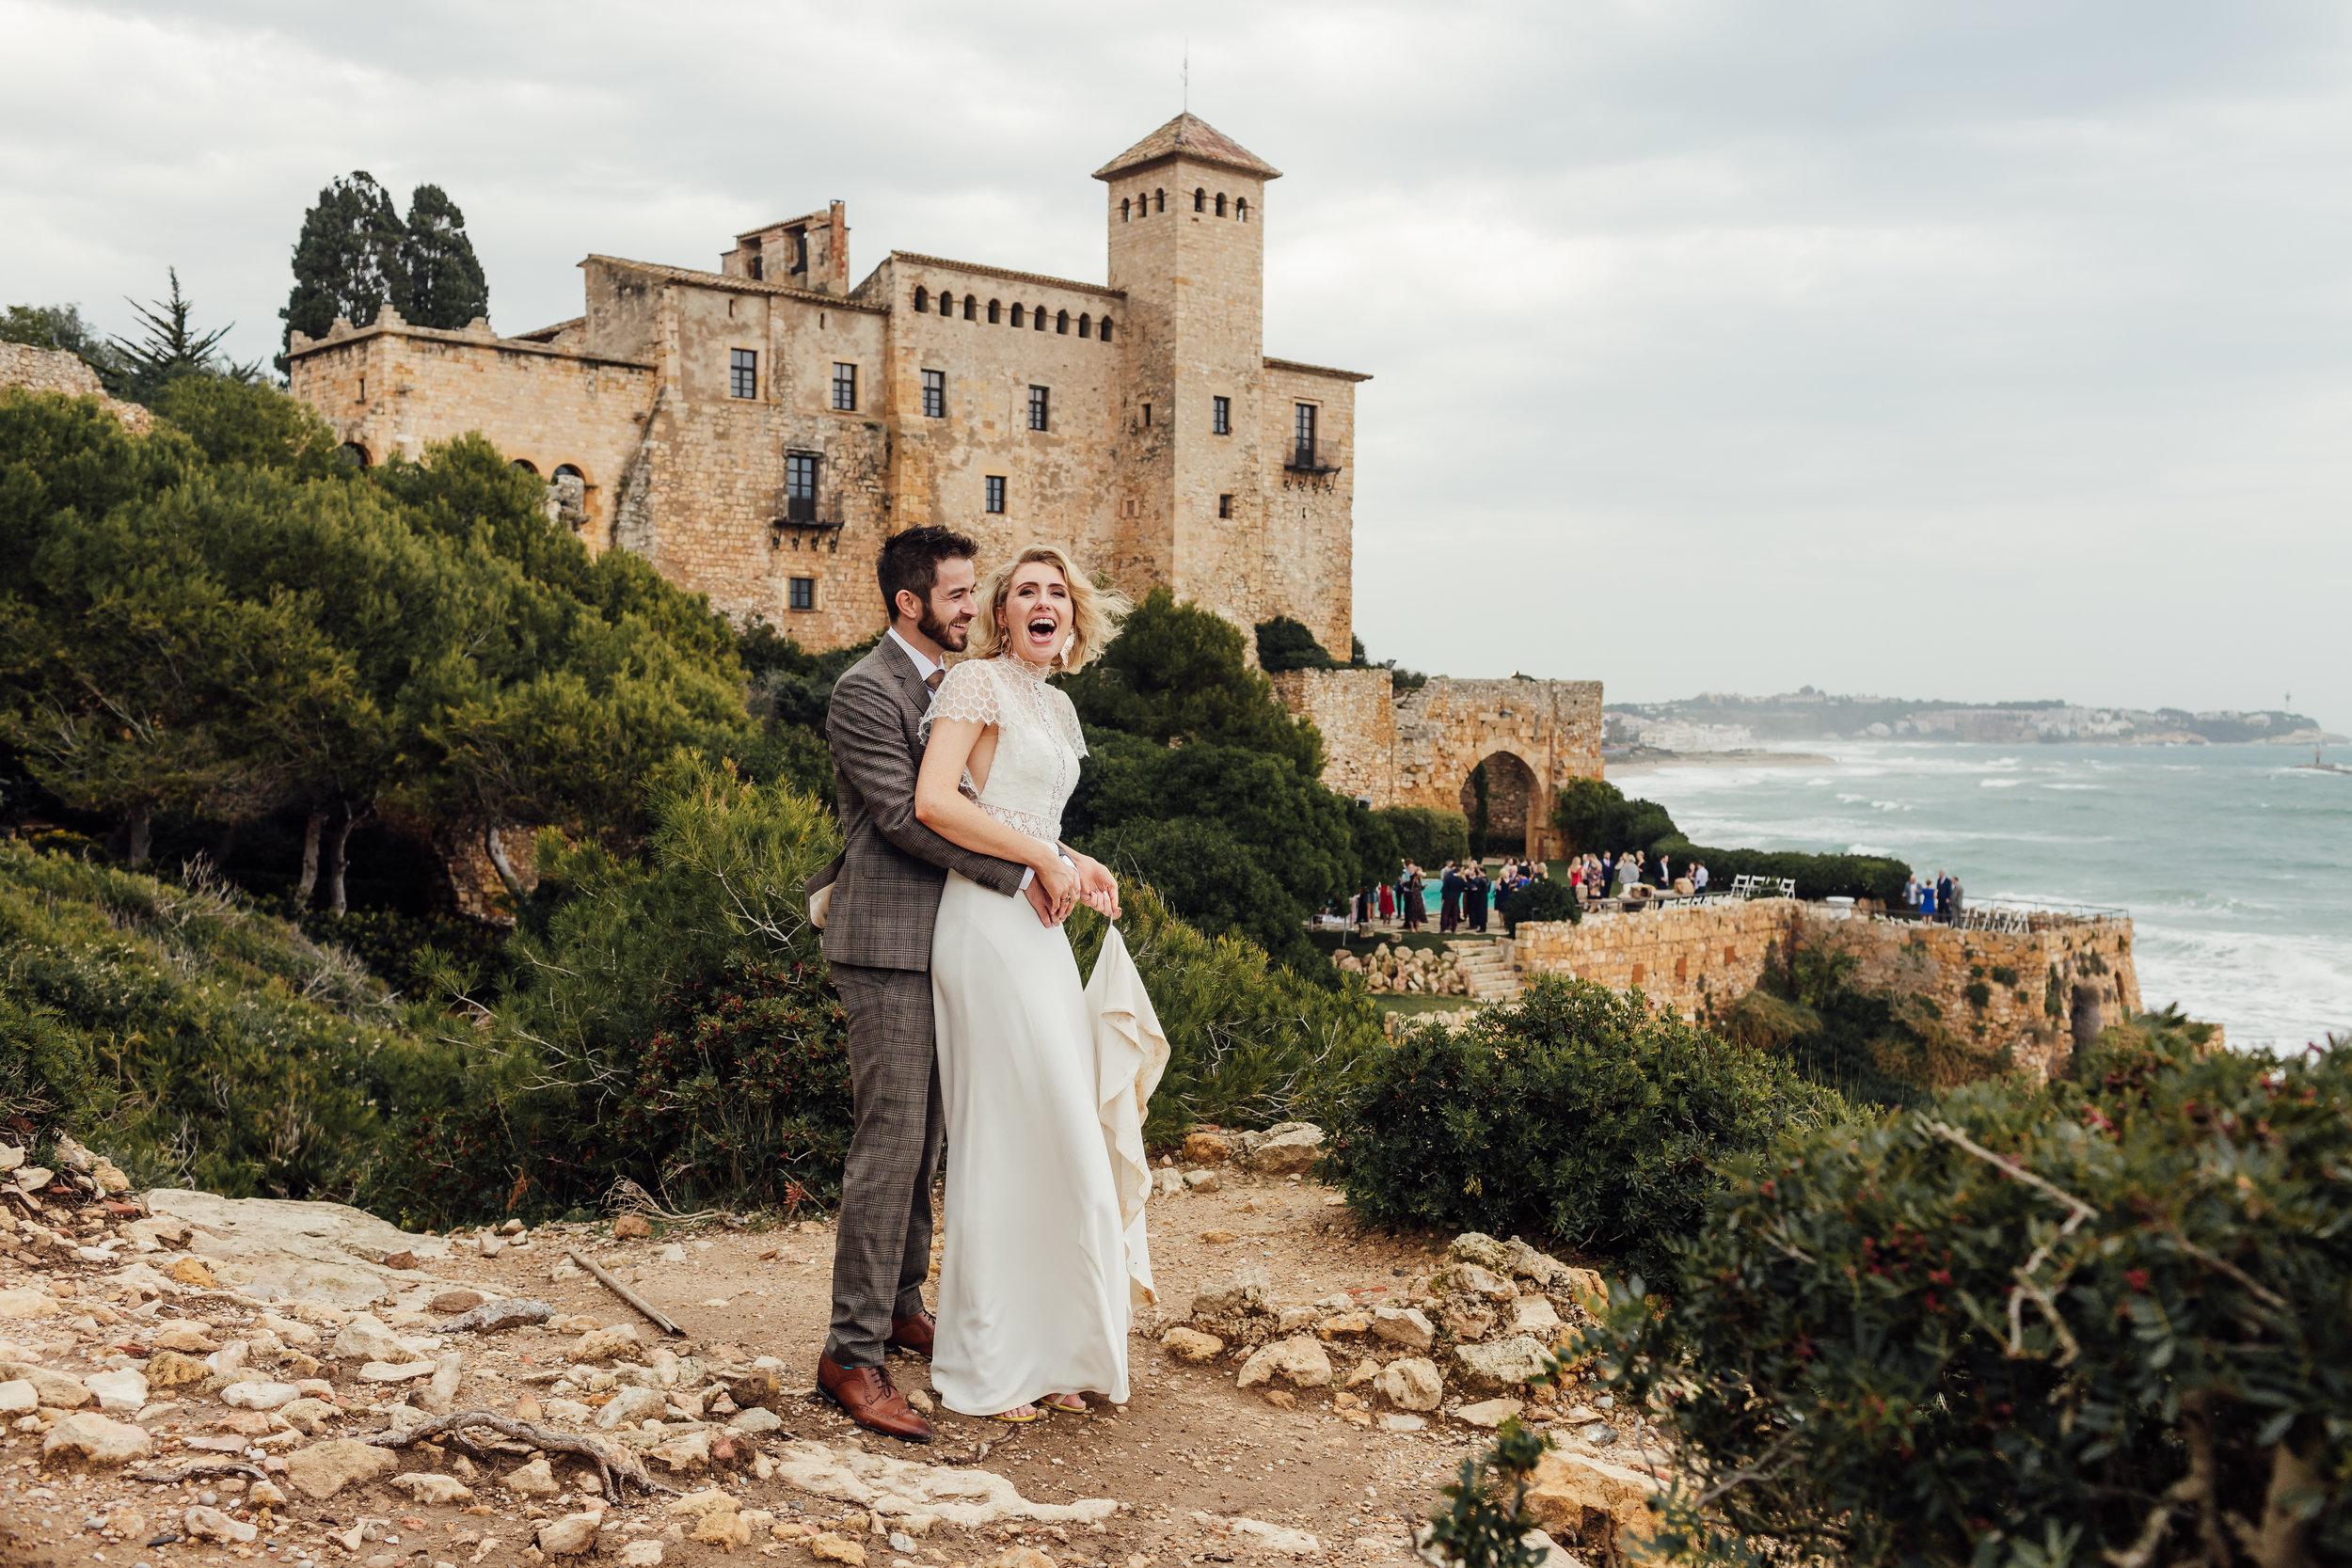 A bride and groom on their wedding day at Castille de Tamarit, Tarragona, Barcelona by Jo Kemp Photography